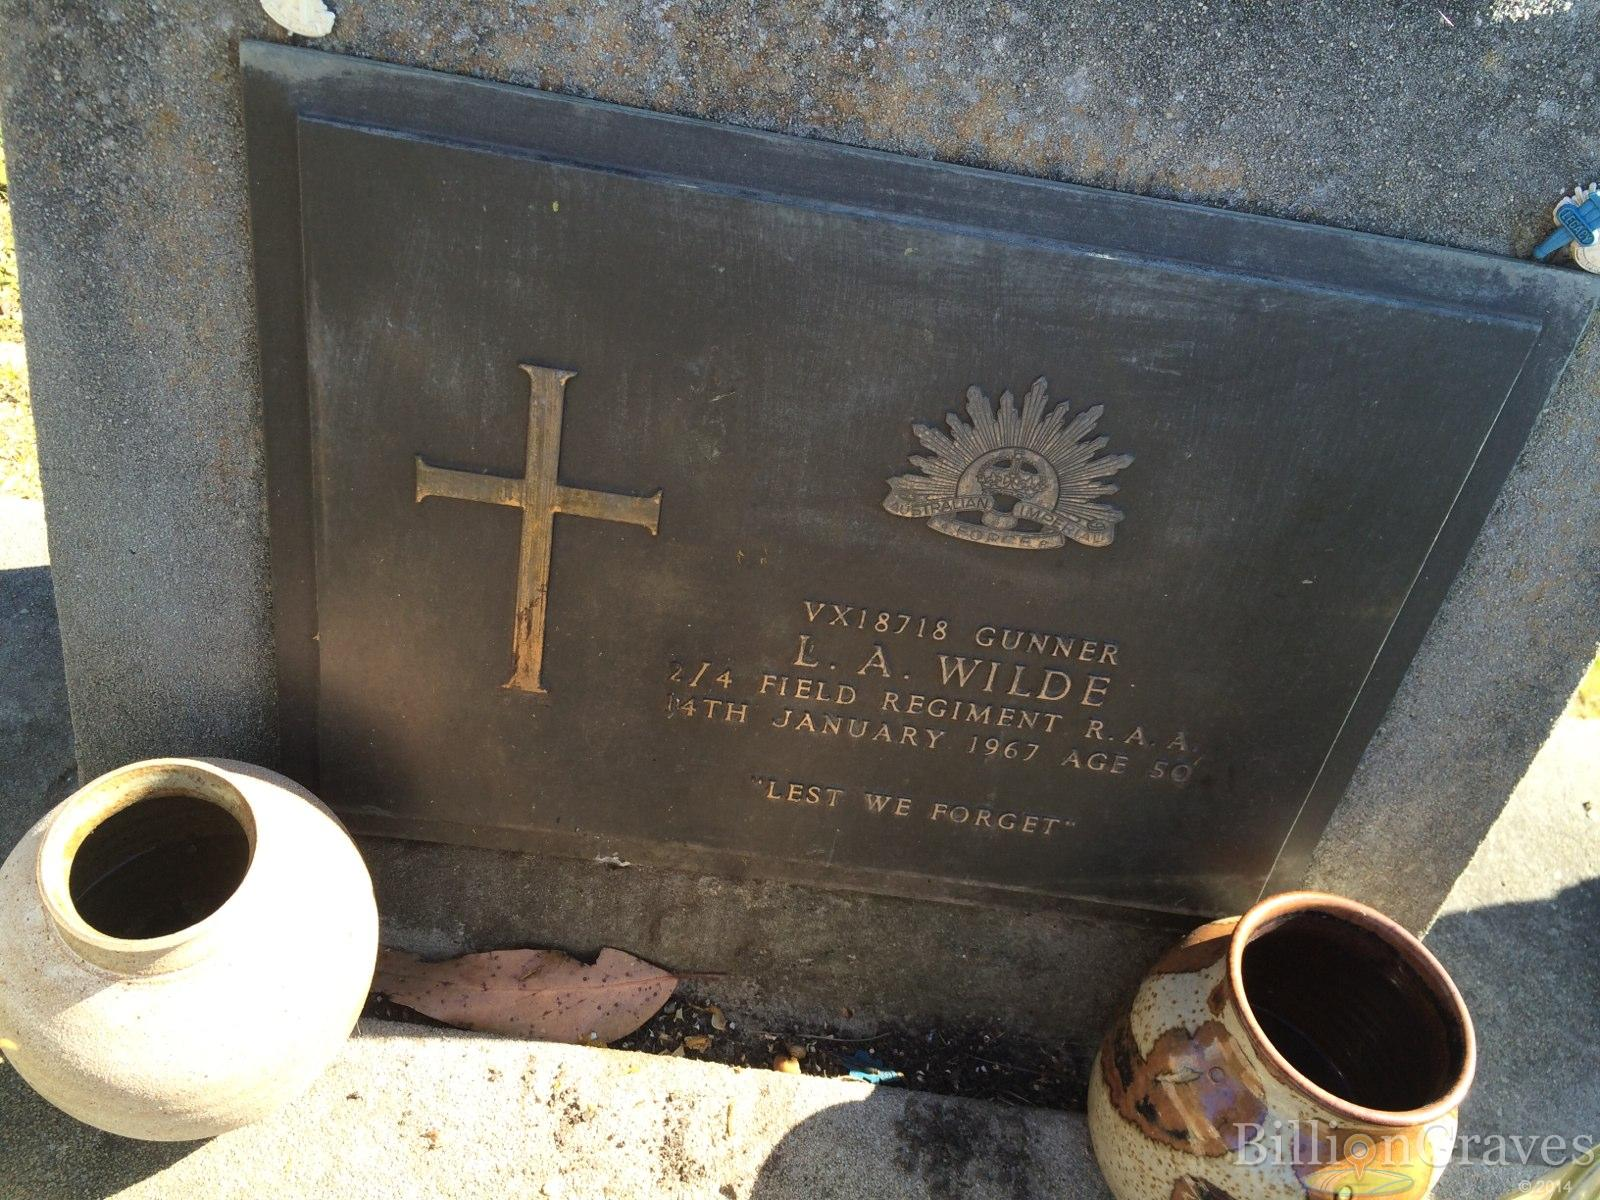 Obituary: Christina L. Wilde | Citizen's News